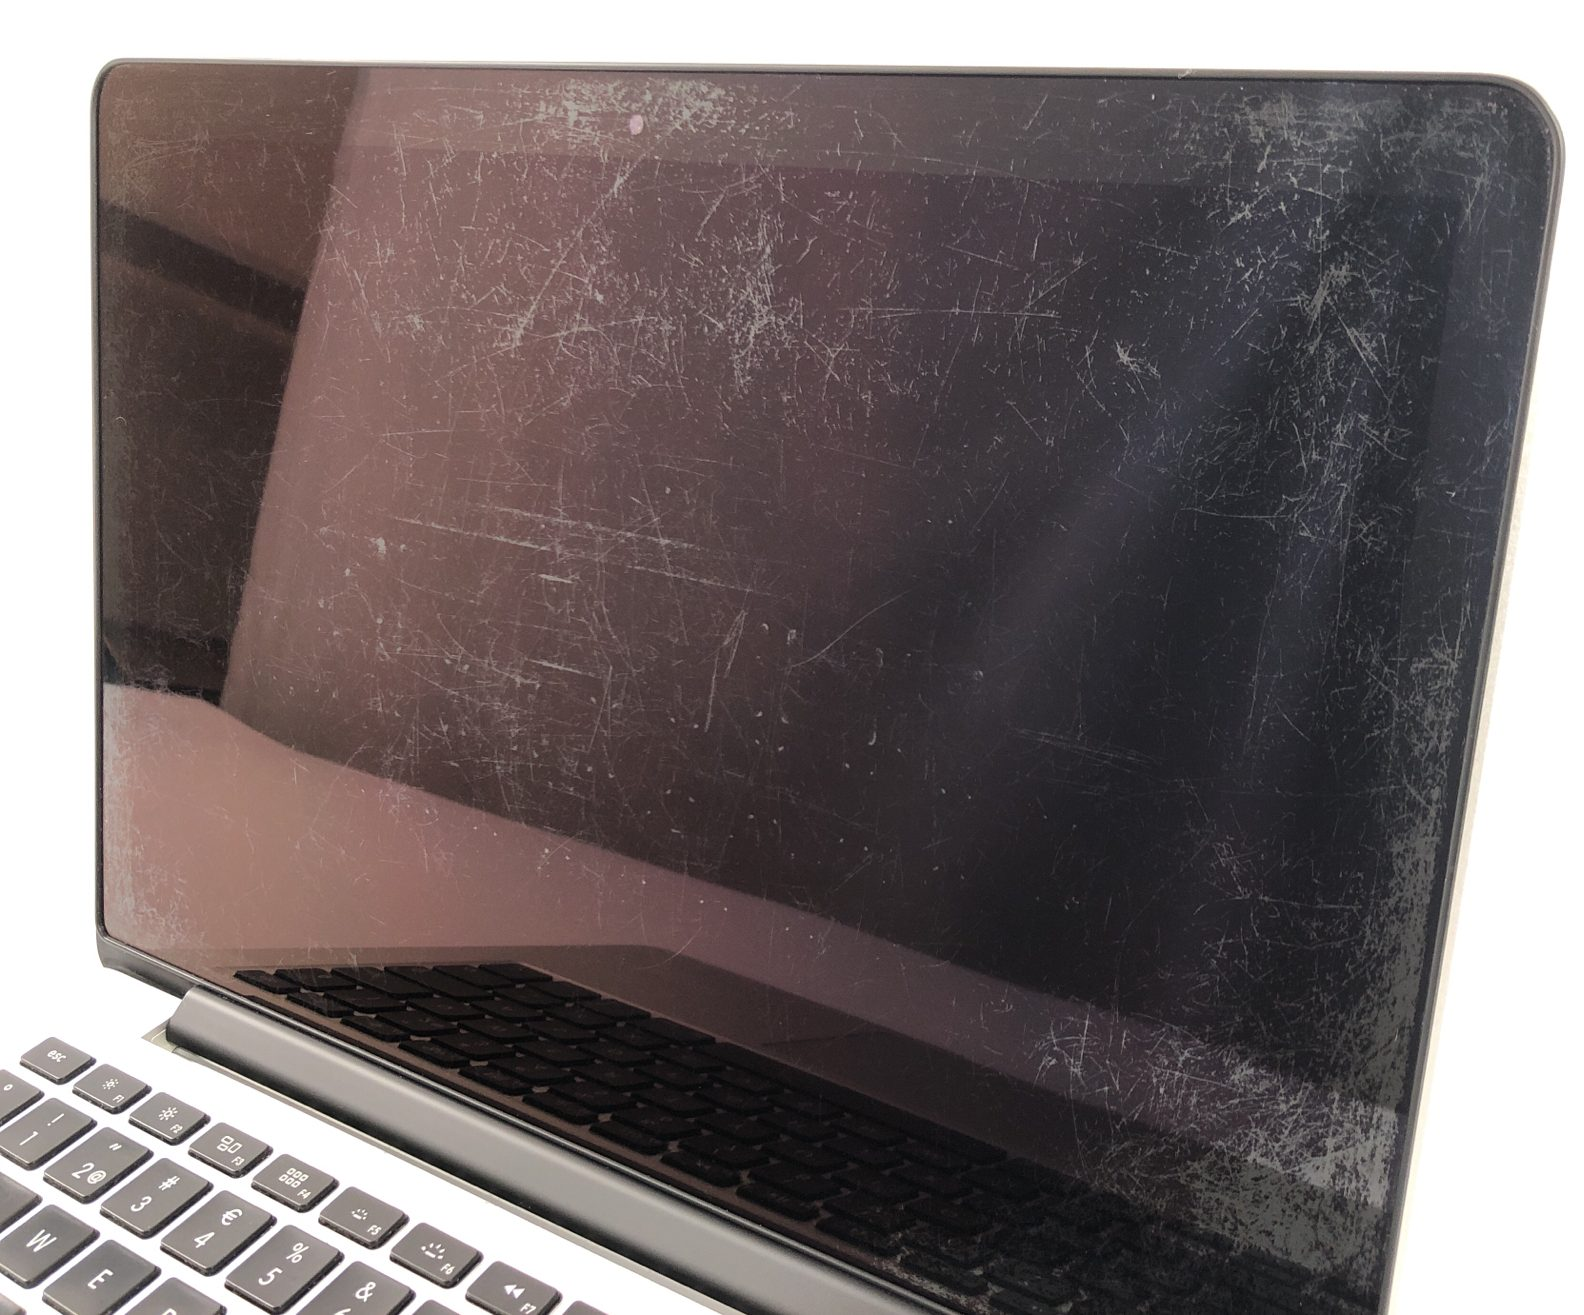 "MacBook Pro Retina 13"" Early 2015 (Intel Core i5 2.7 GHz 8 GB RAM 128 GB SSD), Intel Core i5 2.7 GHz, 8 GB RAM, 128 GB SSD, Kuva 3"